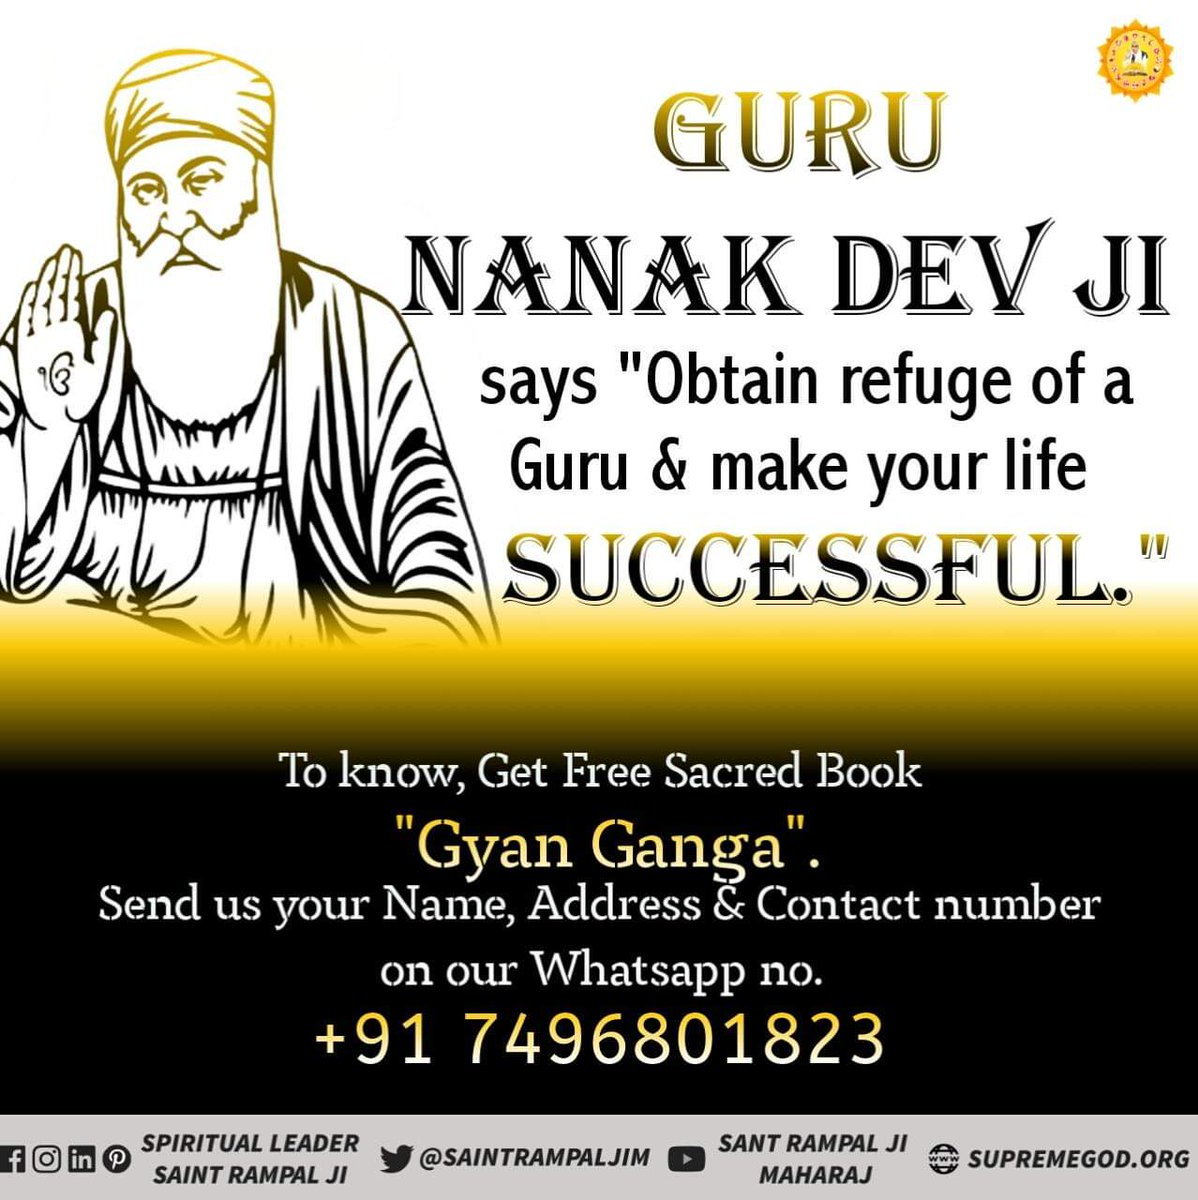 #FridayMotivation Guru Nanak dev ji says Obtain refuge of a Guru & make your life successful. Know by watching spiritual discourses of Sant Rampal ji maharaj on Ishwar channel 8 :30pm